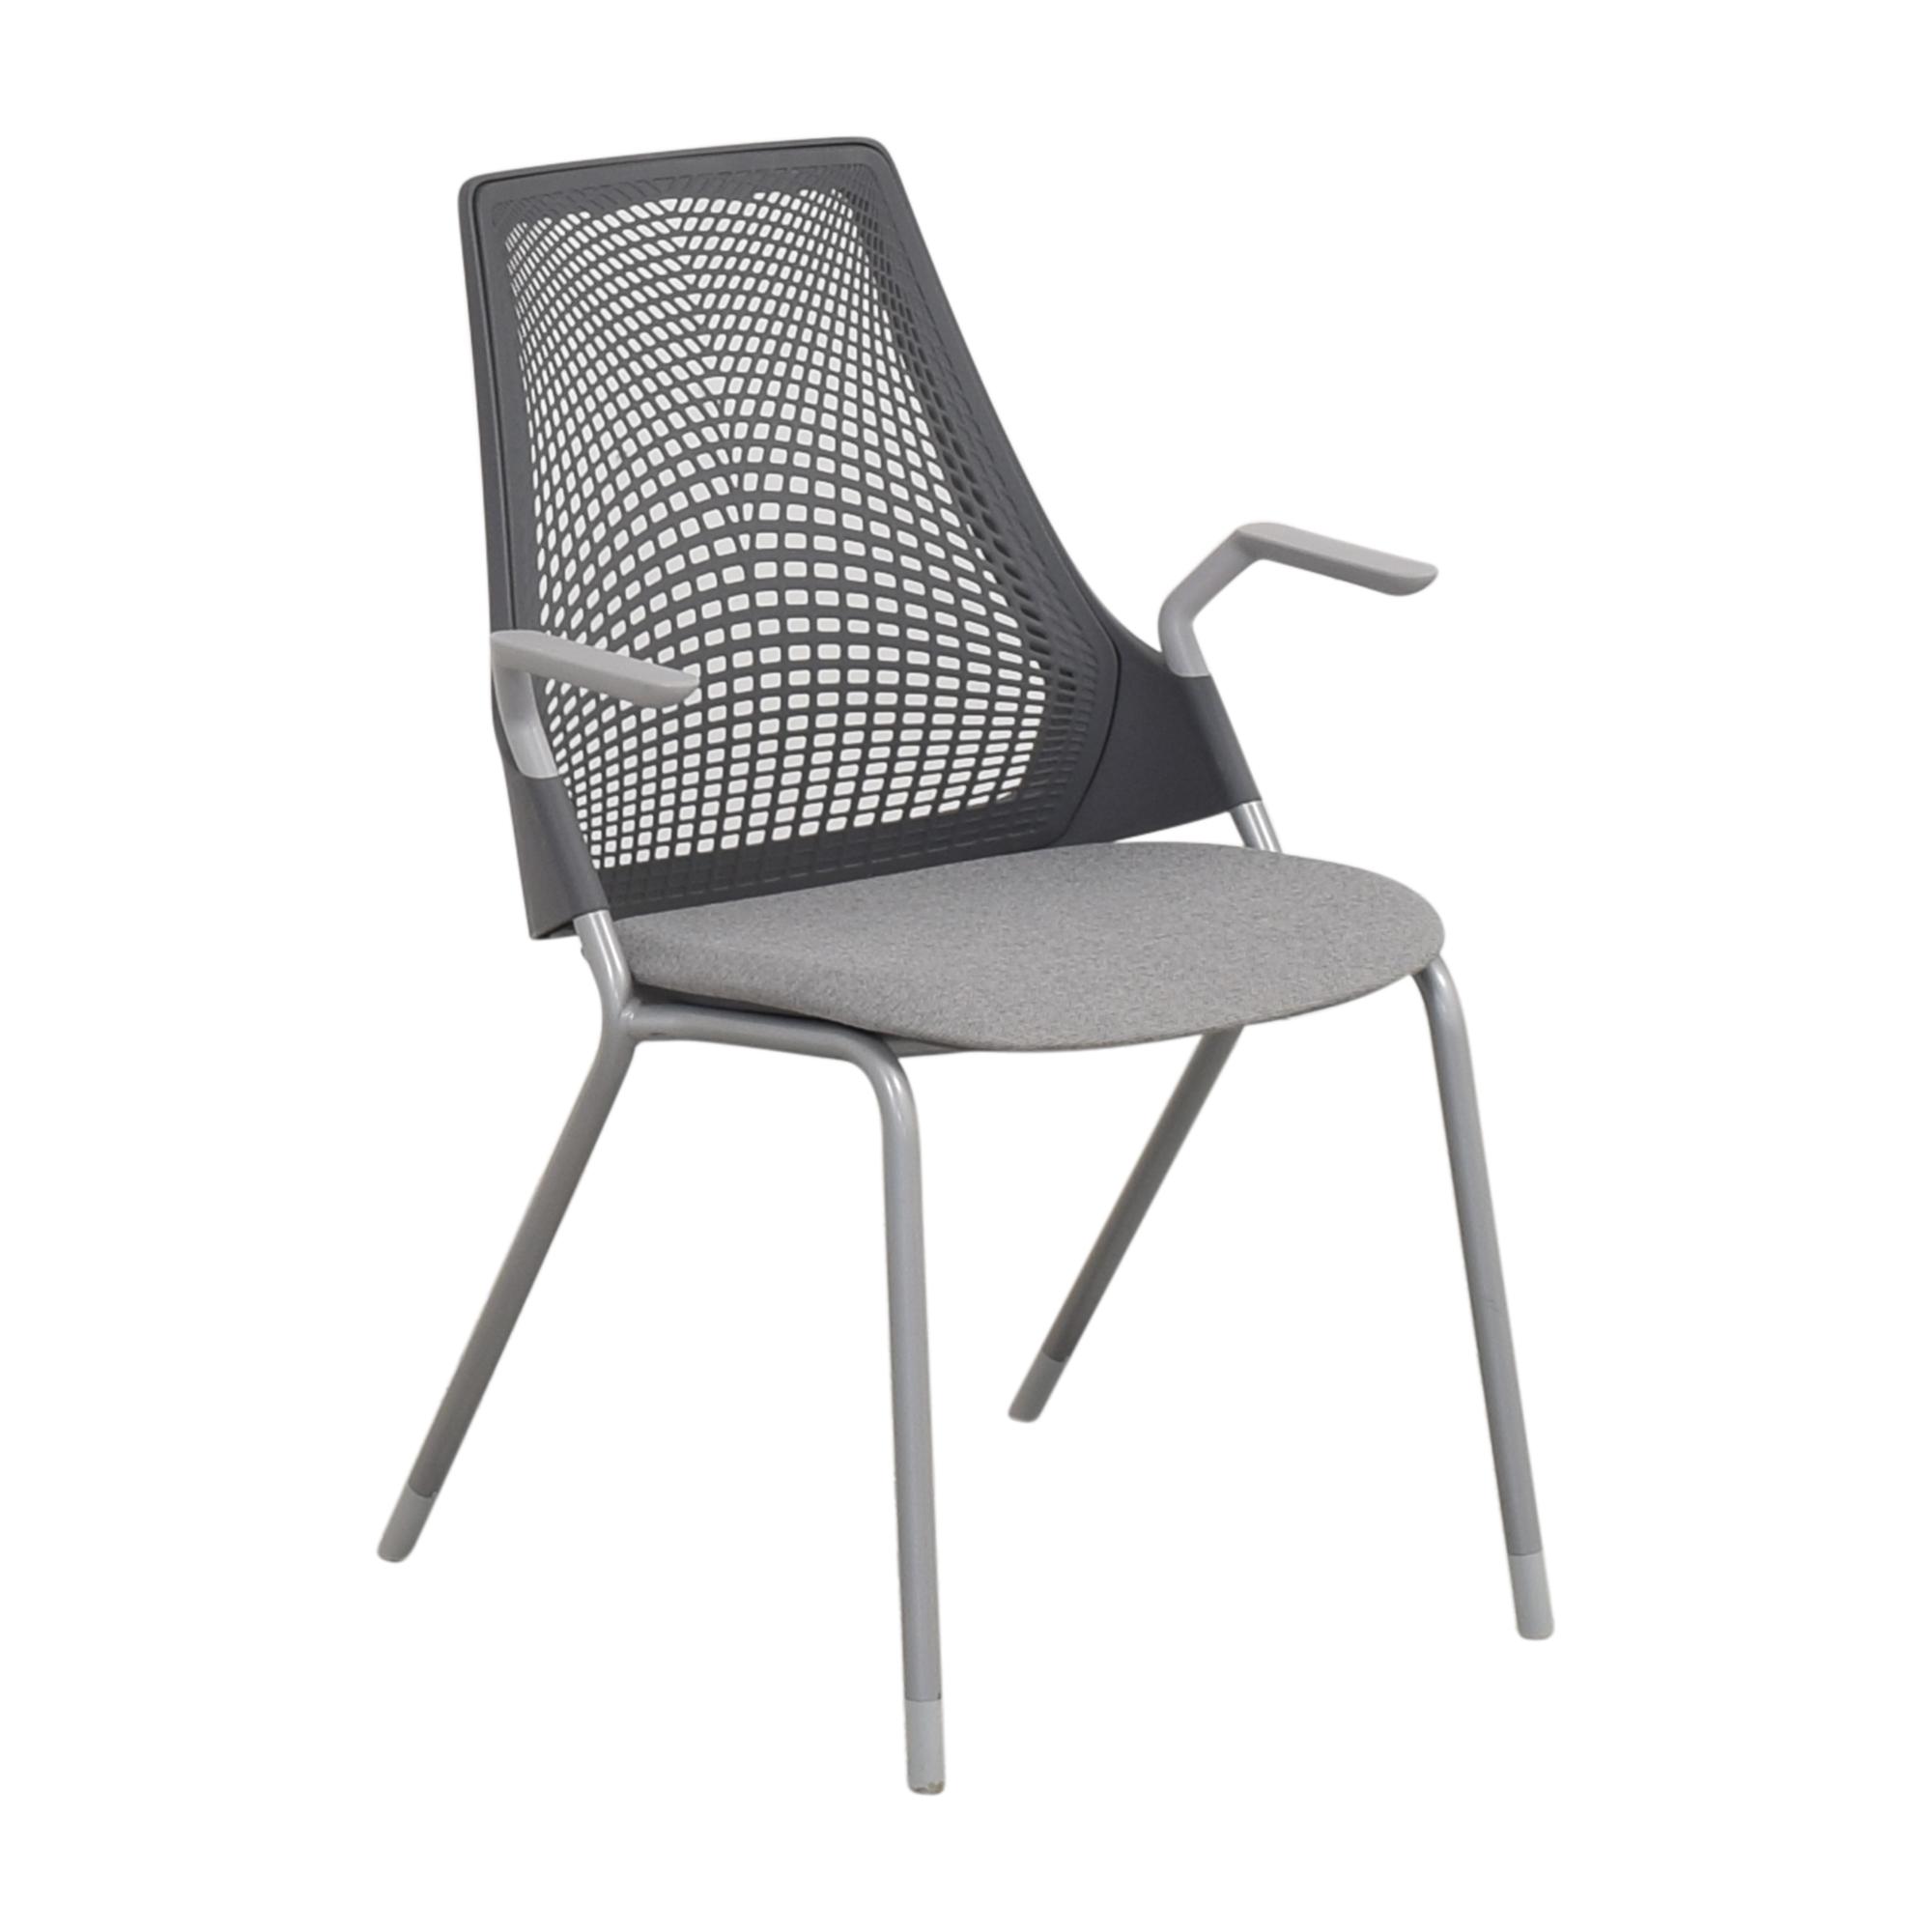 Herman Miller Herman Miller Sayl Side Chair second hand